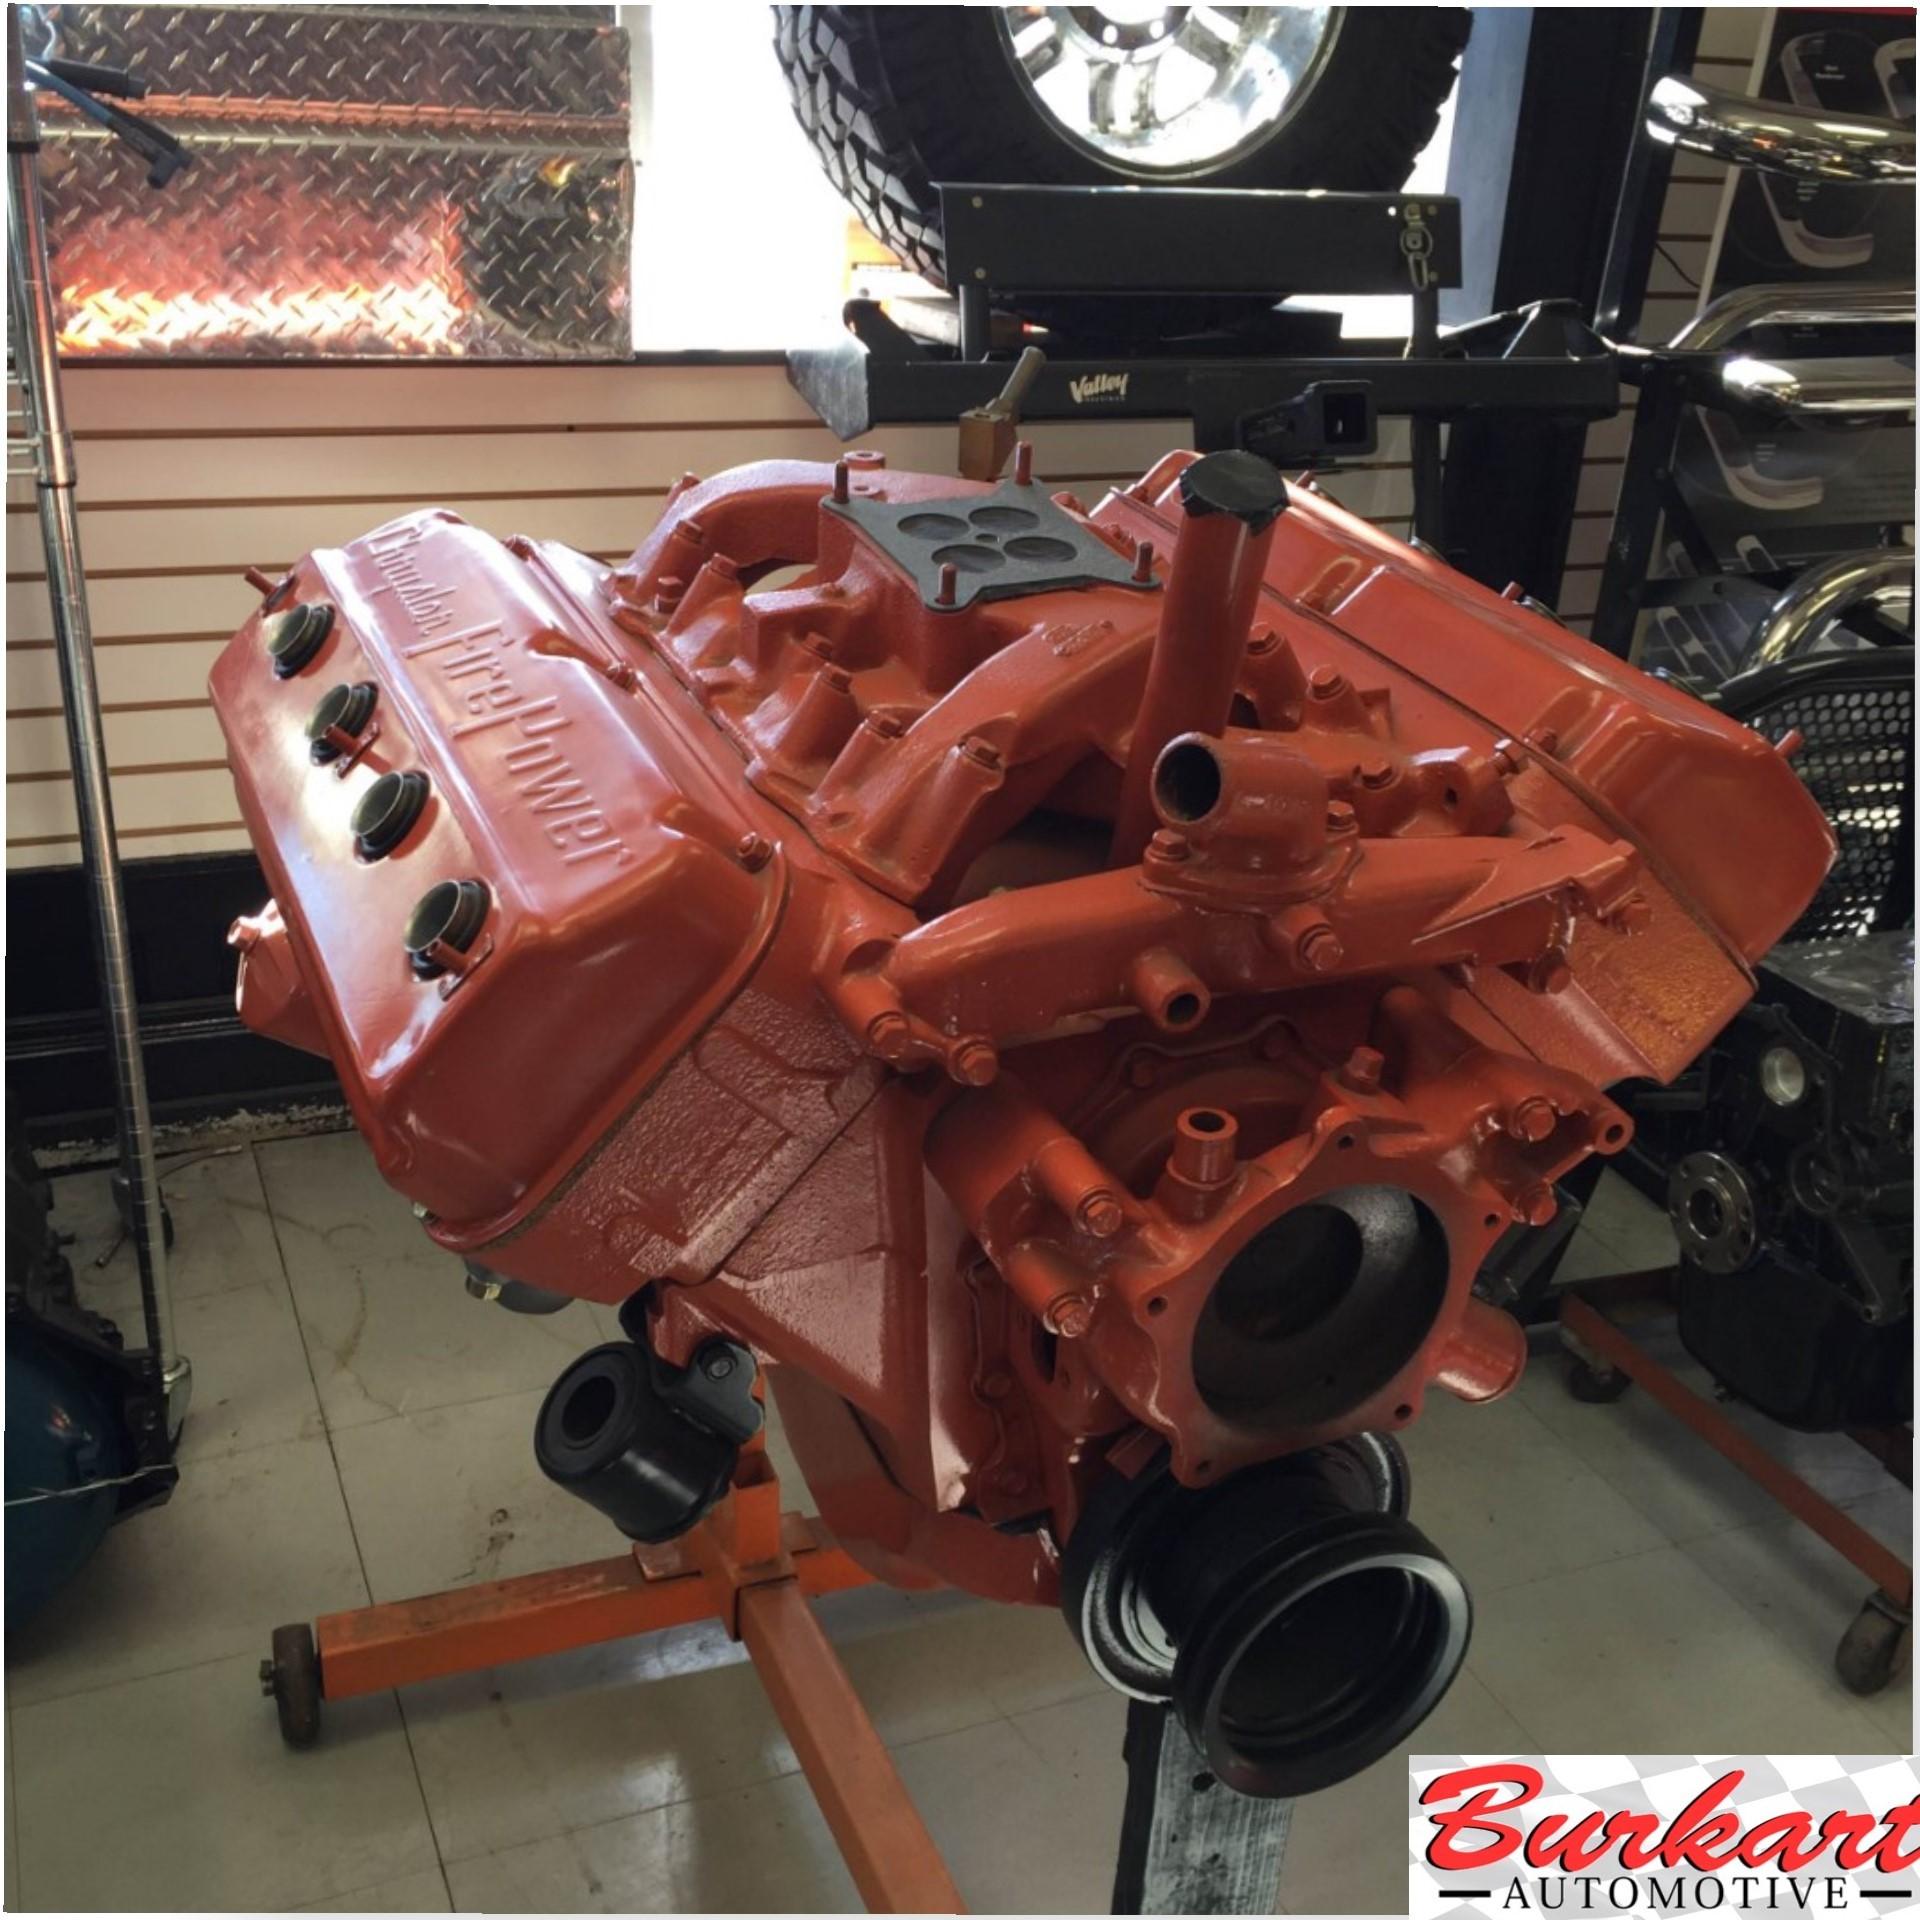 1957 Chrysler Dodge 392 Hemi Professionally Rebuilt Engine